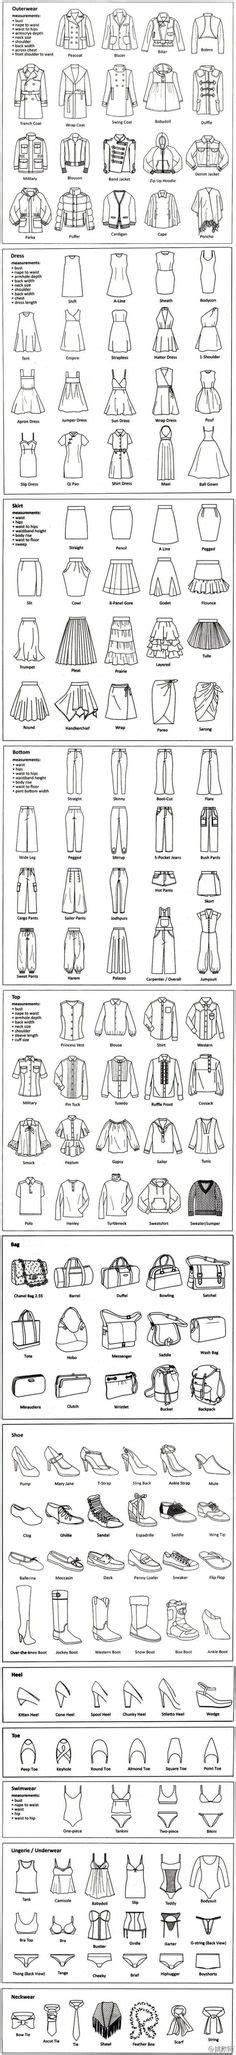 tutorial menggambar fashion cara menjahit kebaya modern pola menjahit pakaian anak